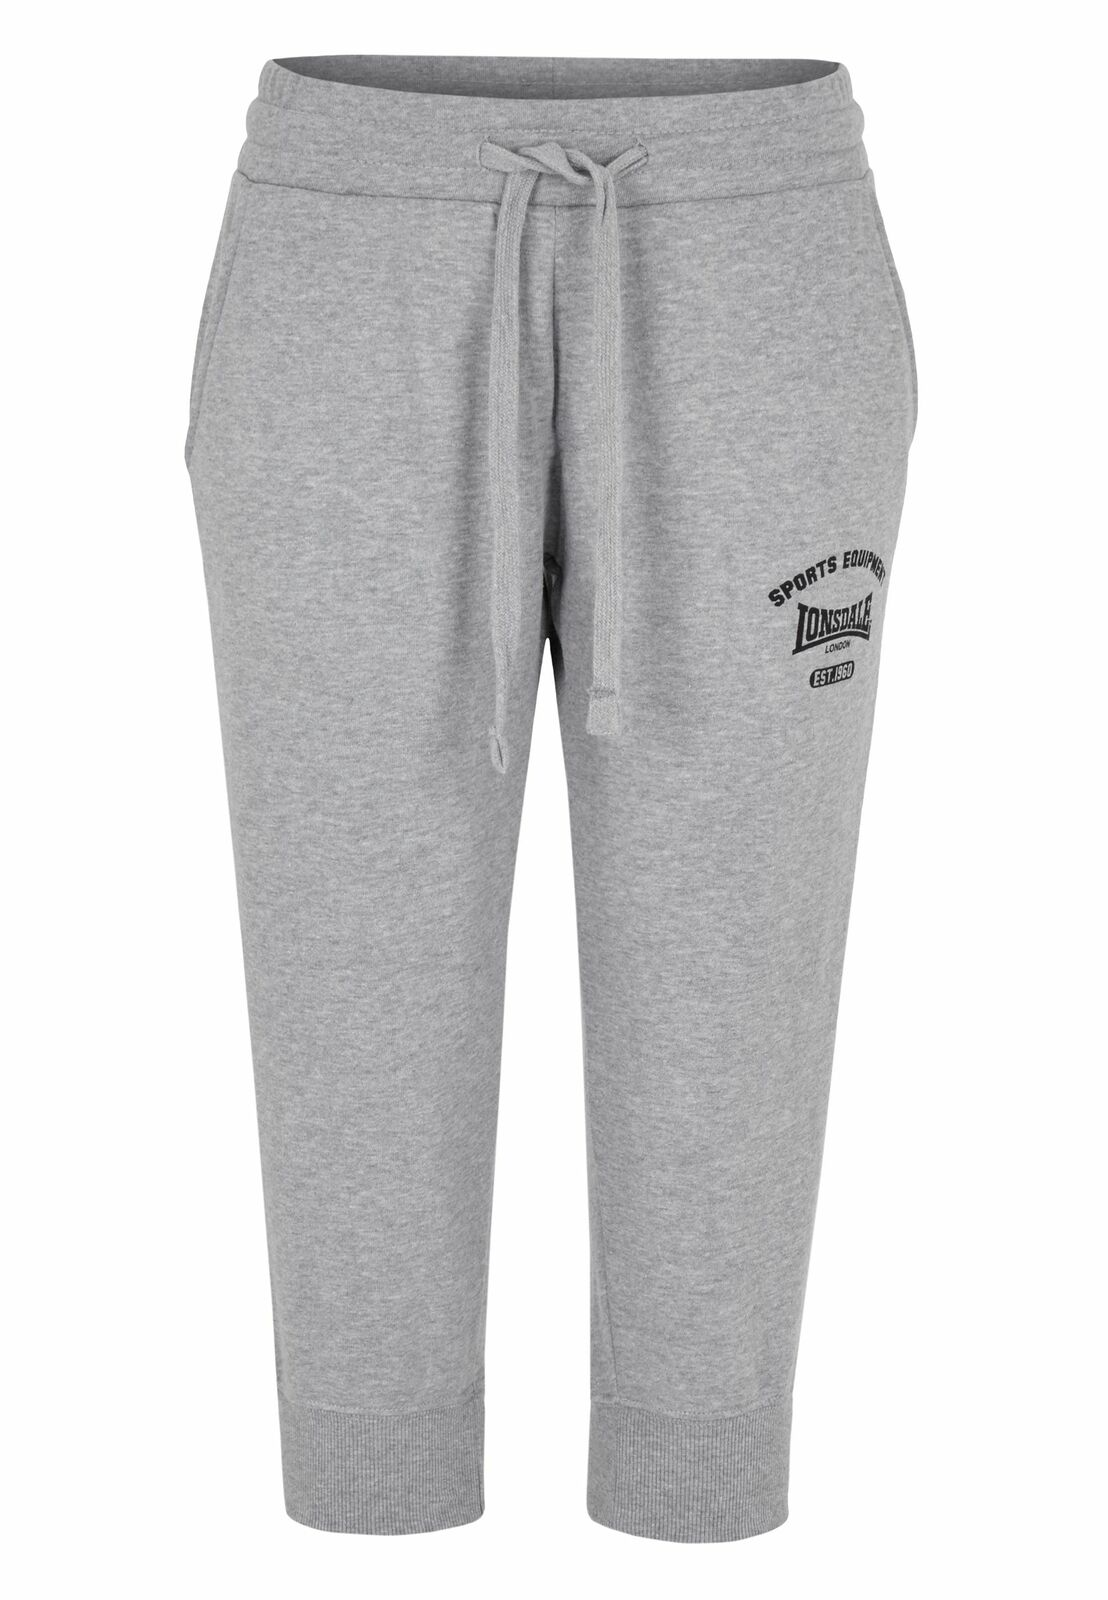 Lonsdale Damen 3/4 Sweatpants Leeds grey Fitness NEU S M L XL Brandlogo Label